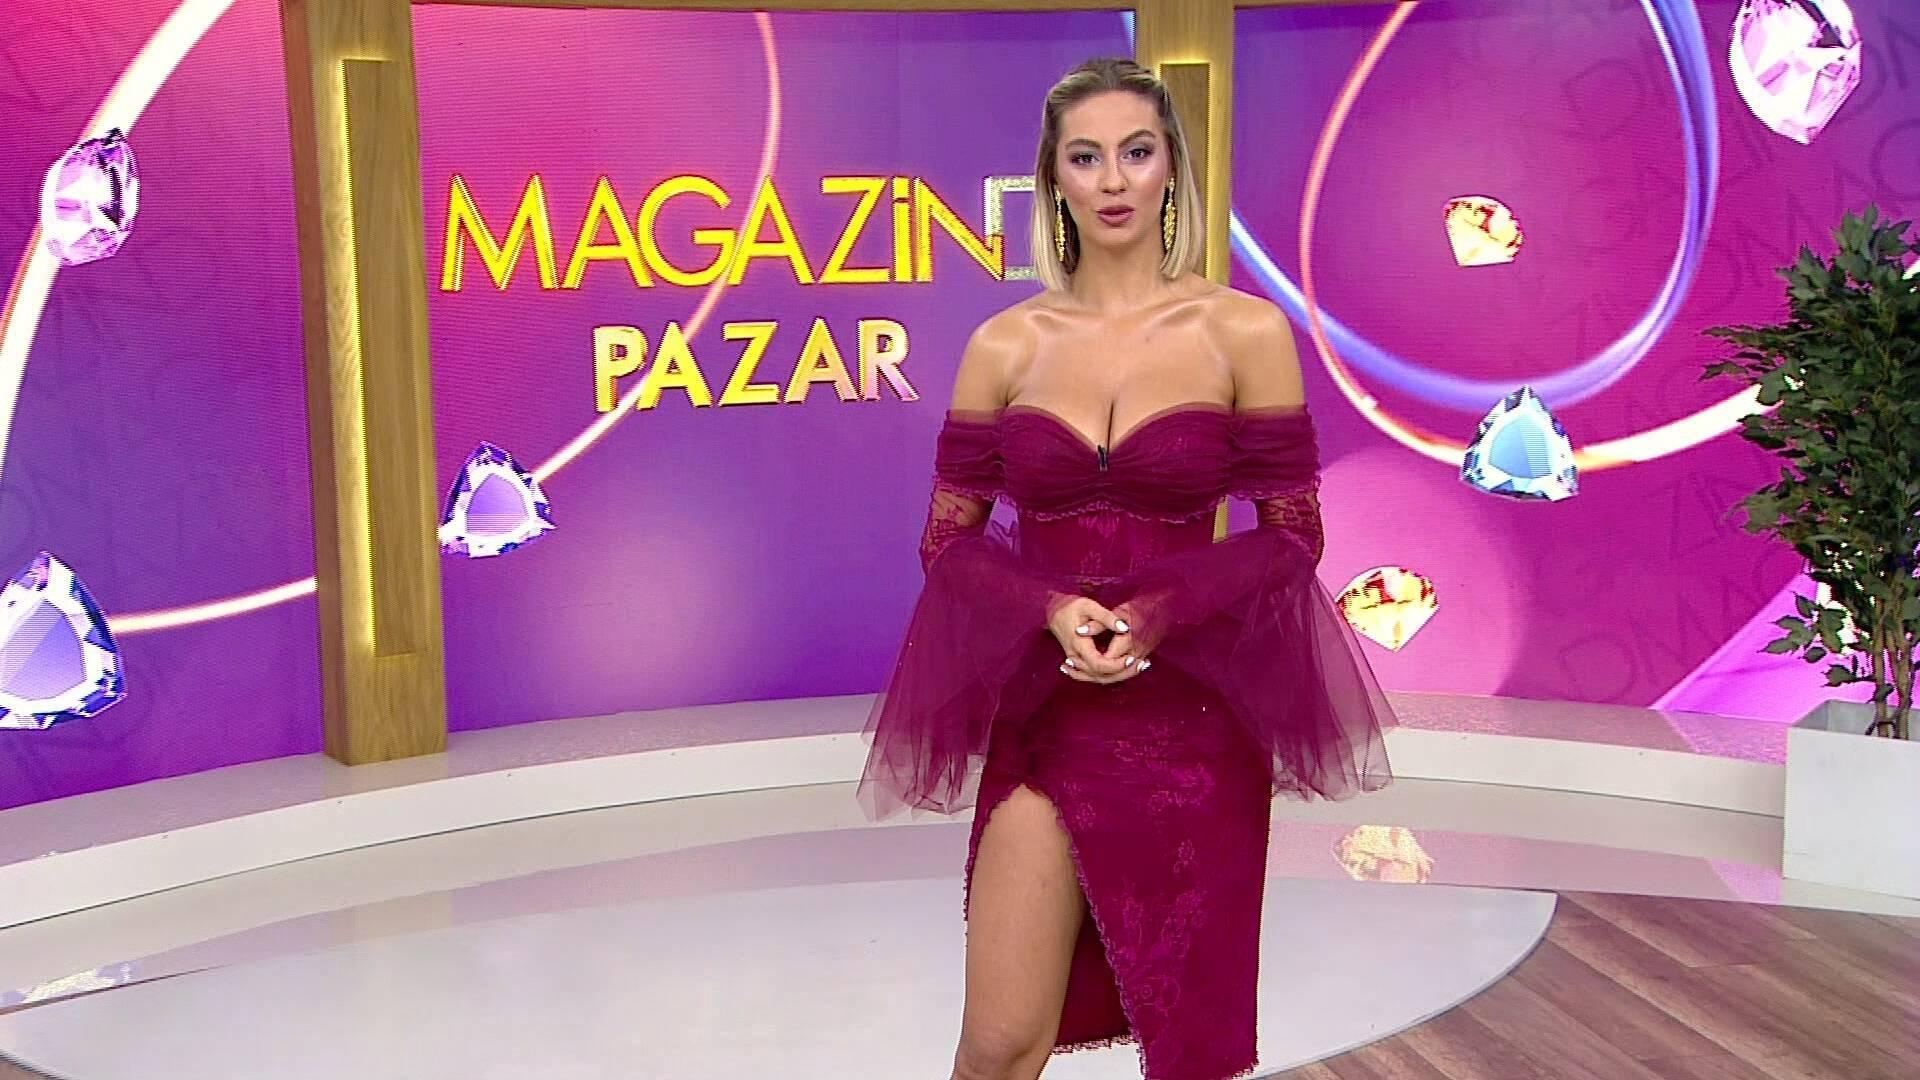 02.09.2018 / Magazin D Pazar